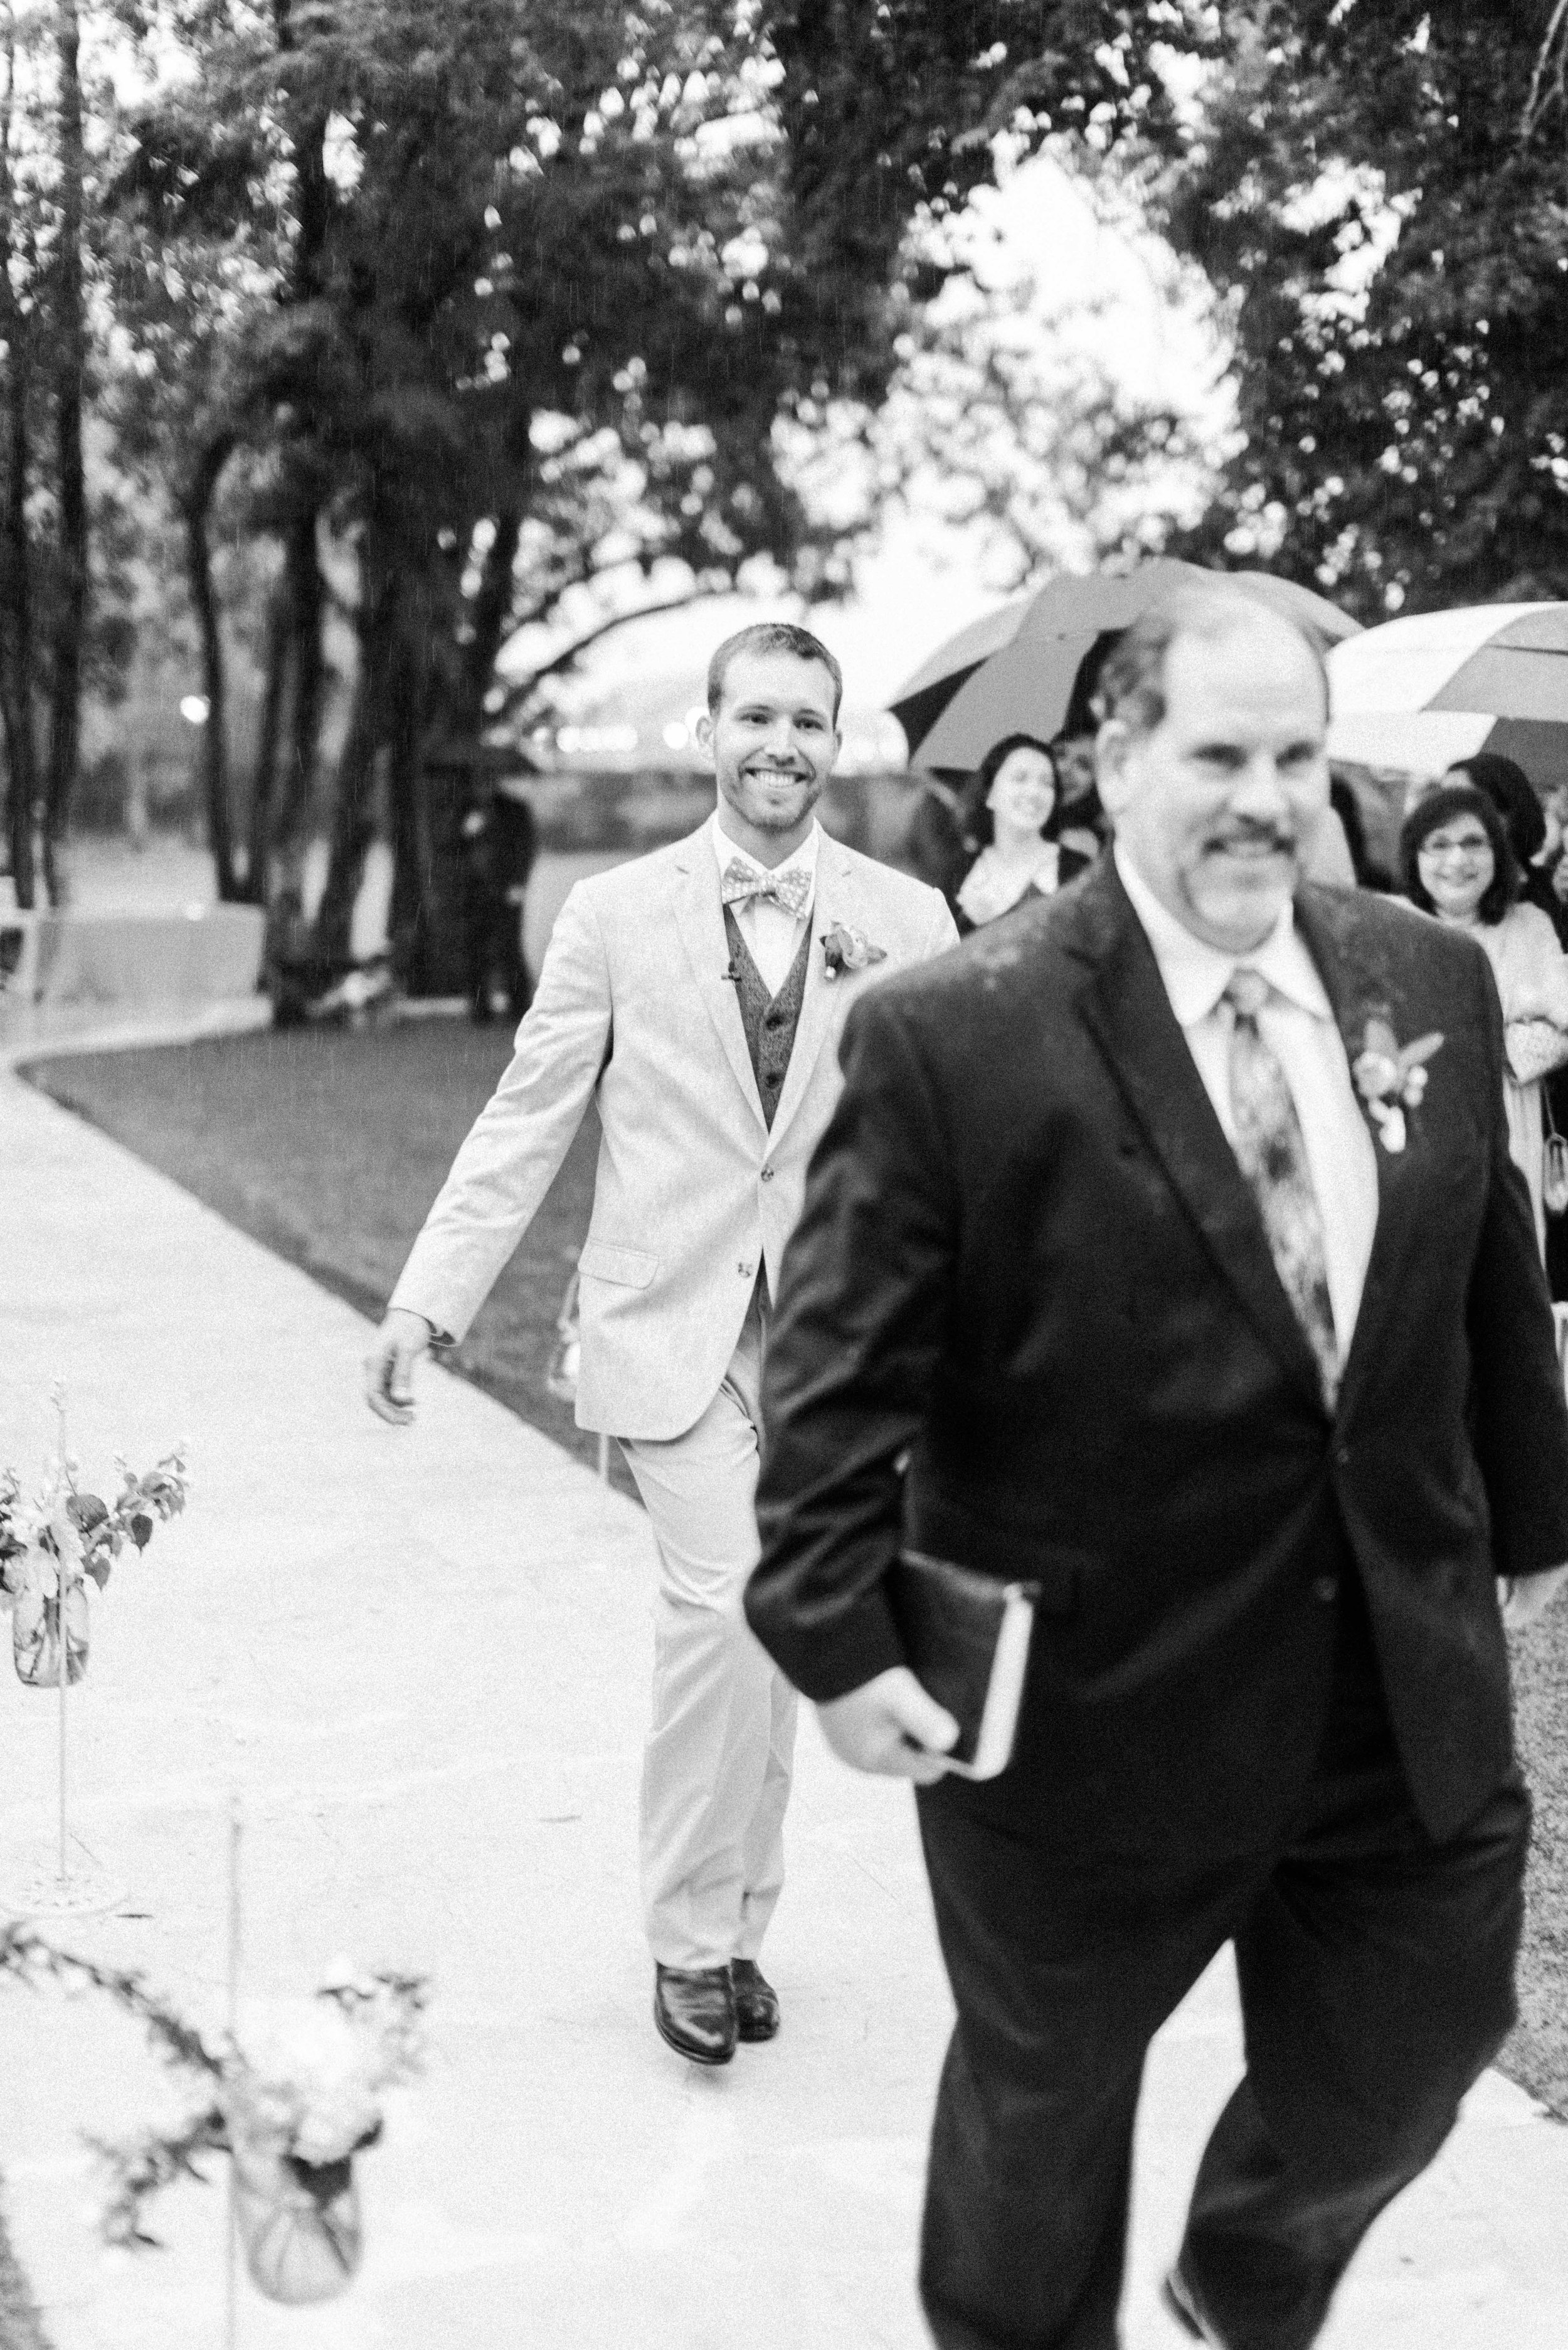 The-Knot-Wedding-Houston-Photographer-Fine-Art-Dana-Fernandez-Photography-Film-9 copy.jpg